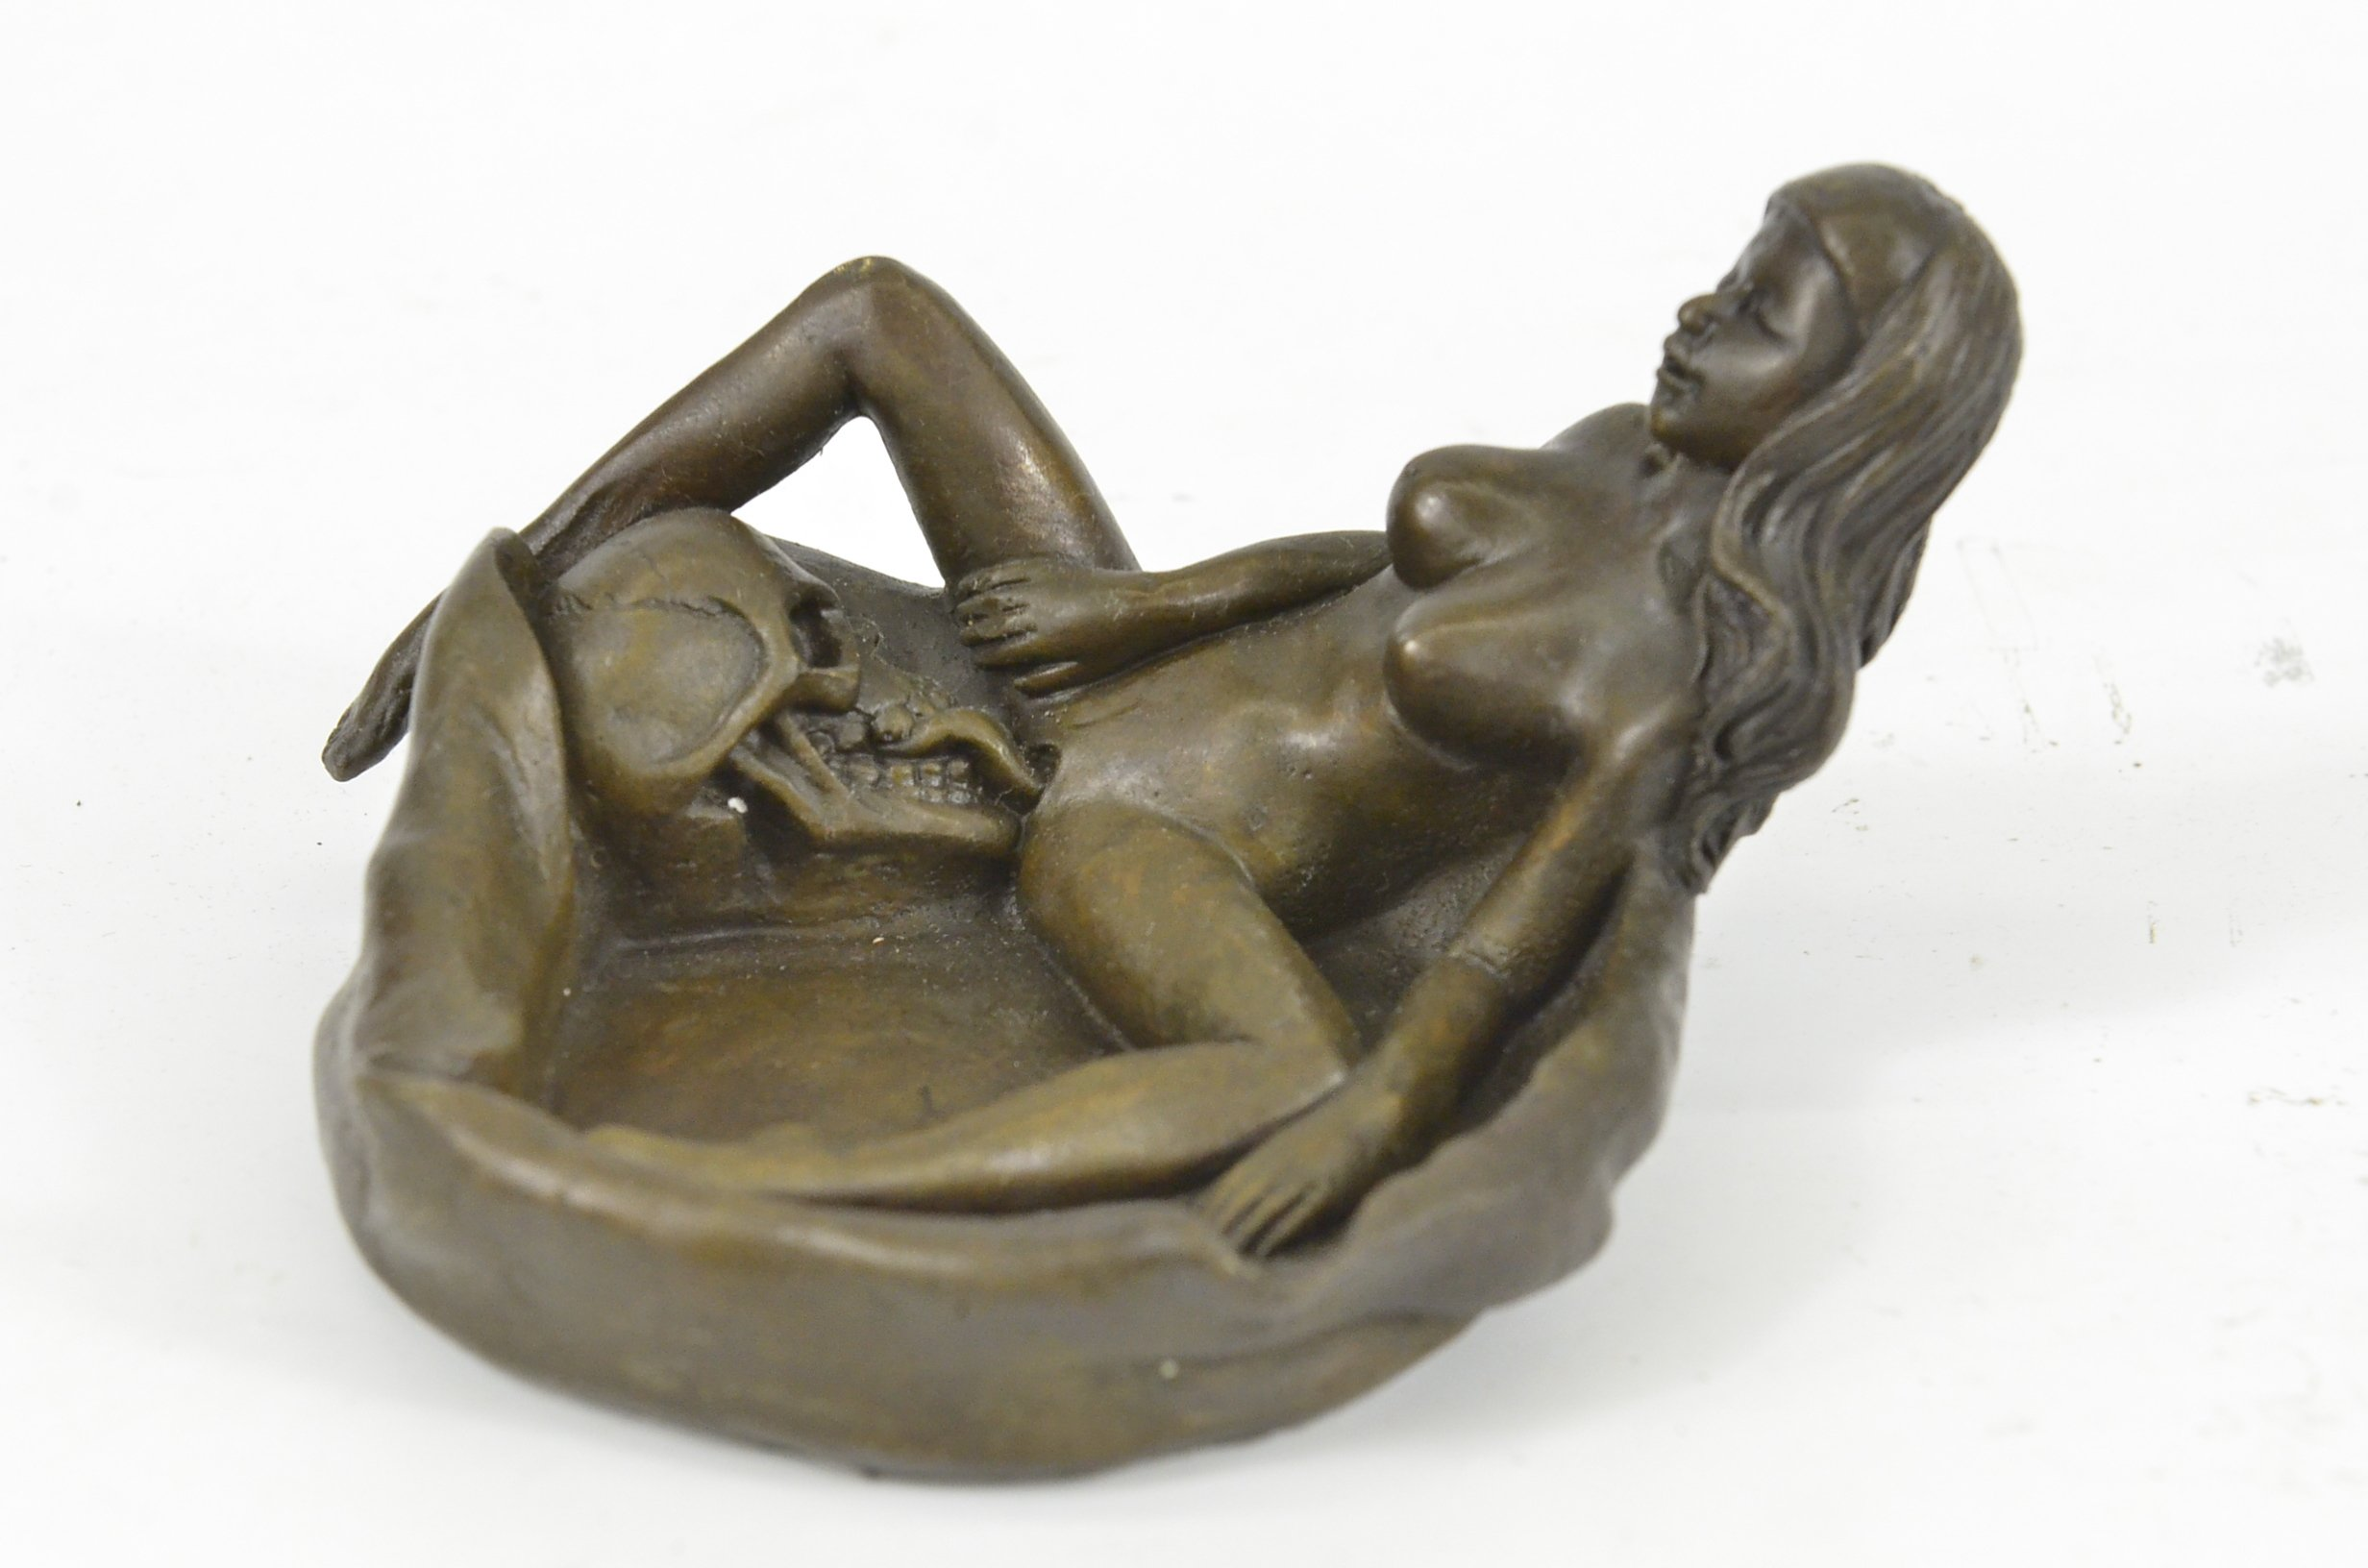 Handmade European Bronze Sculpture Signed Original Collectible Nude Female with Skull Ashtray Sale Bronze Statue -1X-XNRQ-021-Decor Collectible Gift